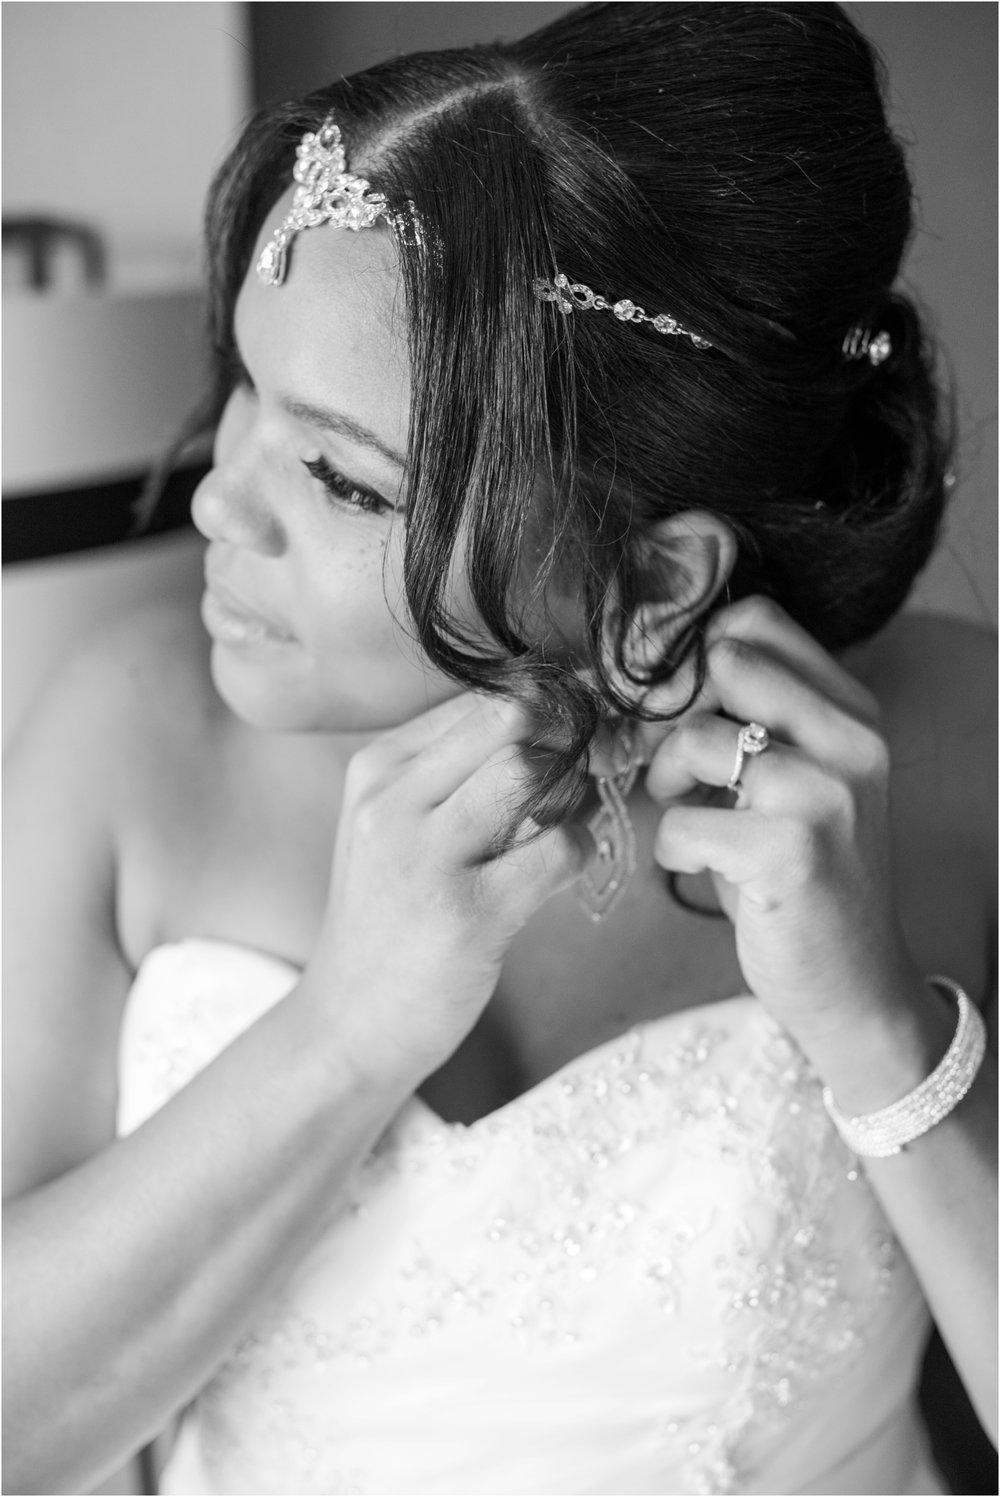 jaclyn-auletta-photography-blog-north-carolina-wedding-photographer-blogger_0008.jpg